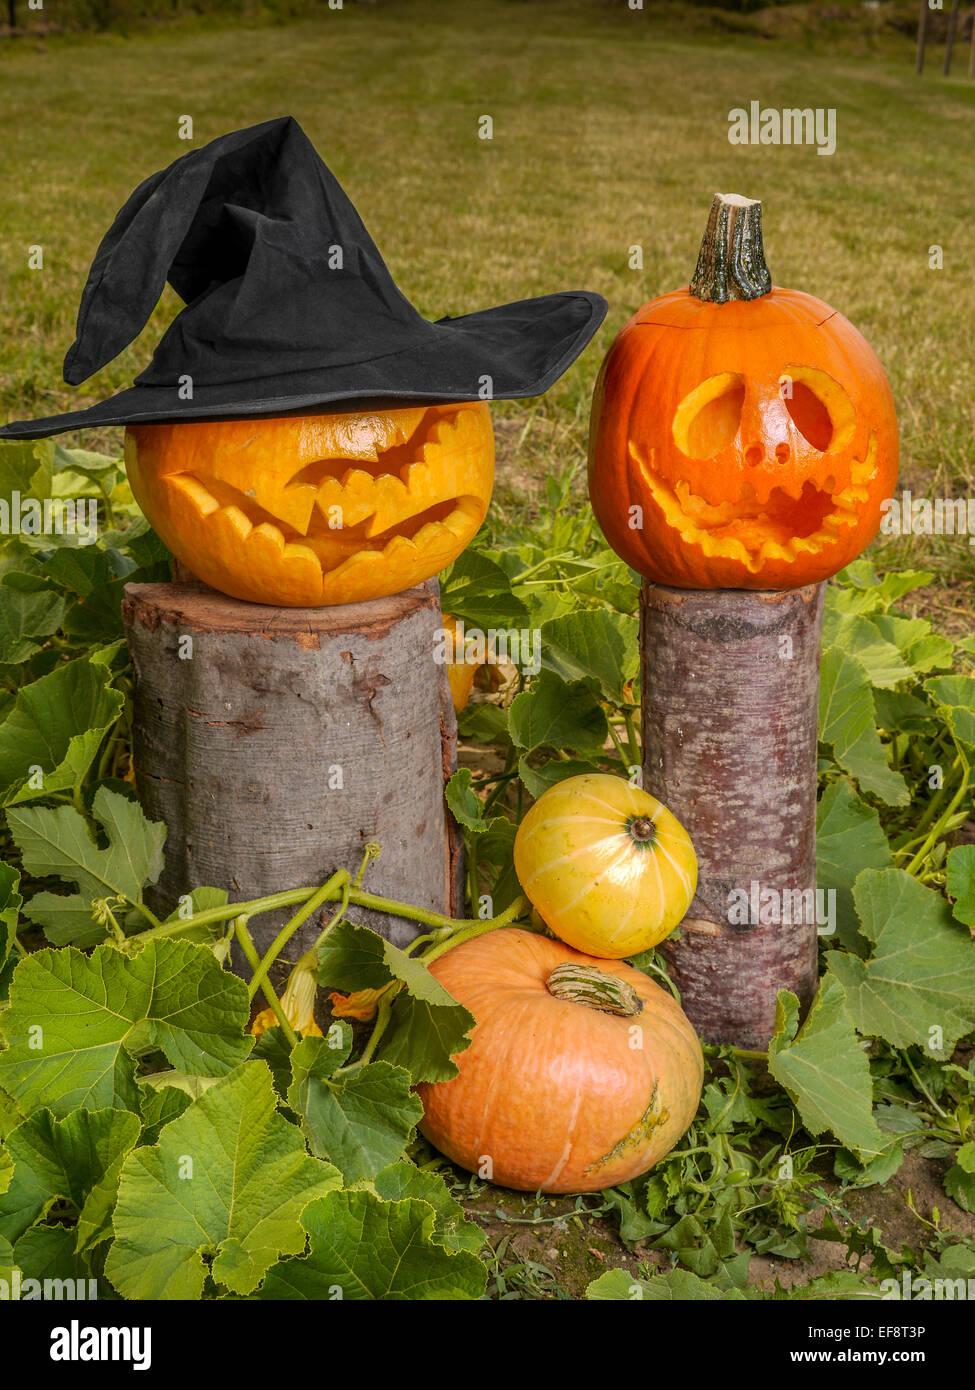 Jack-o-lantern pumpkins in the garden - Stock Image